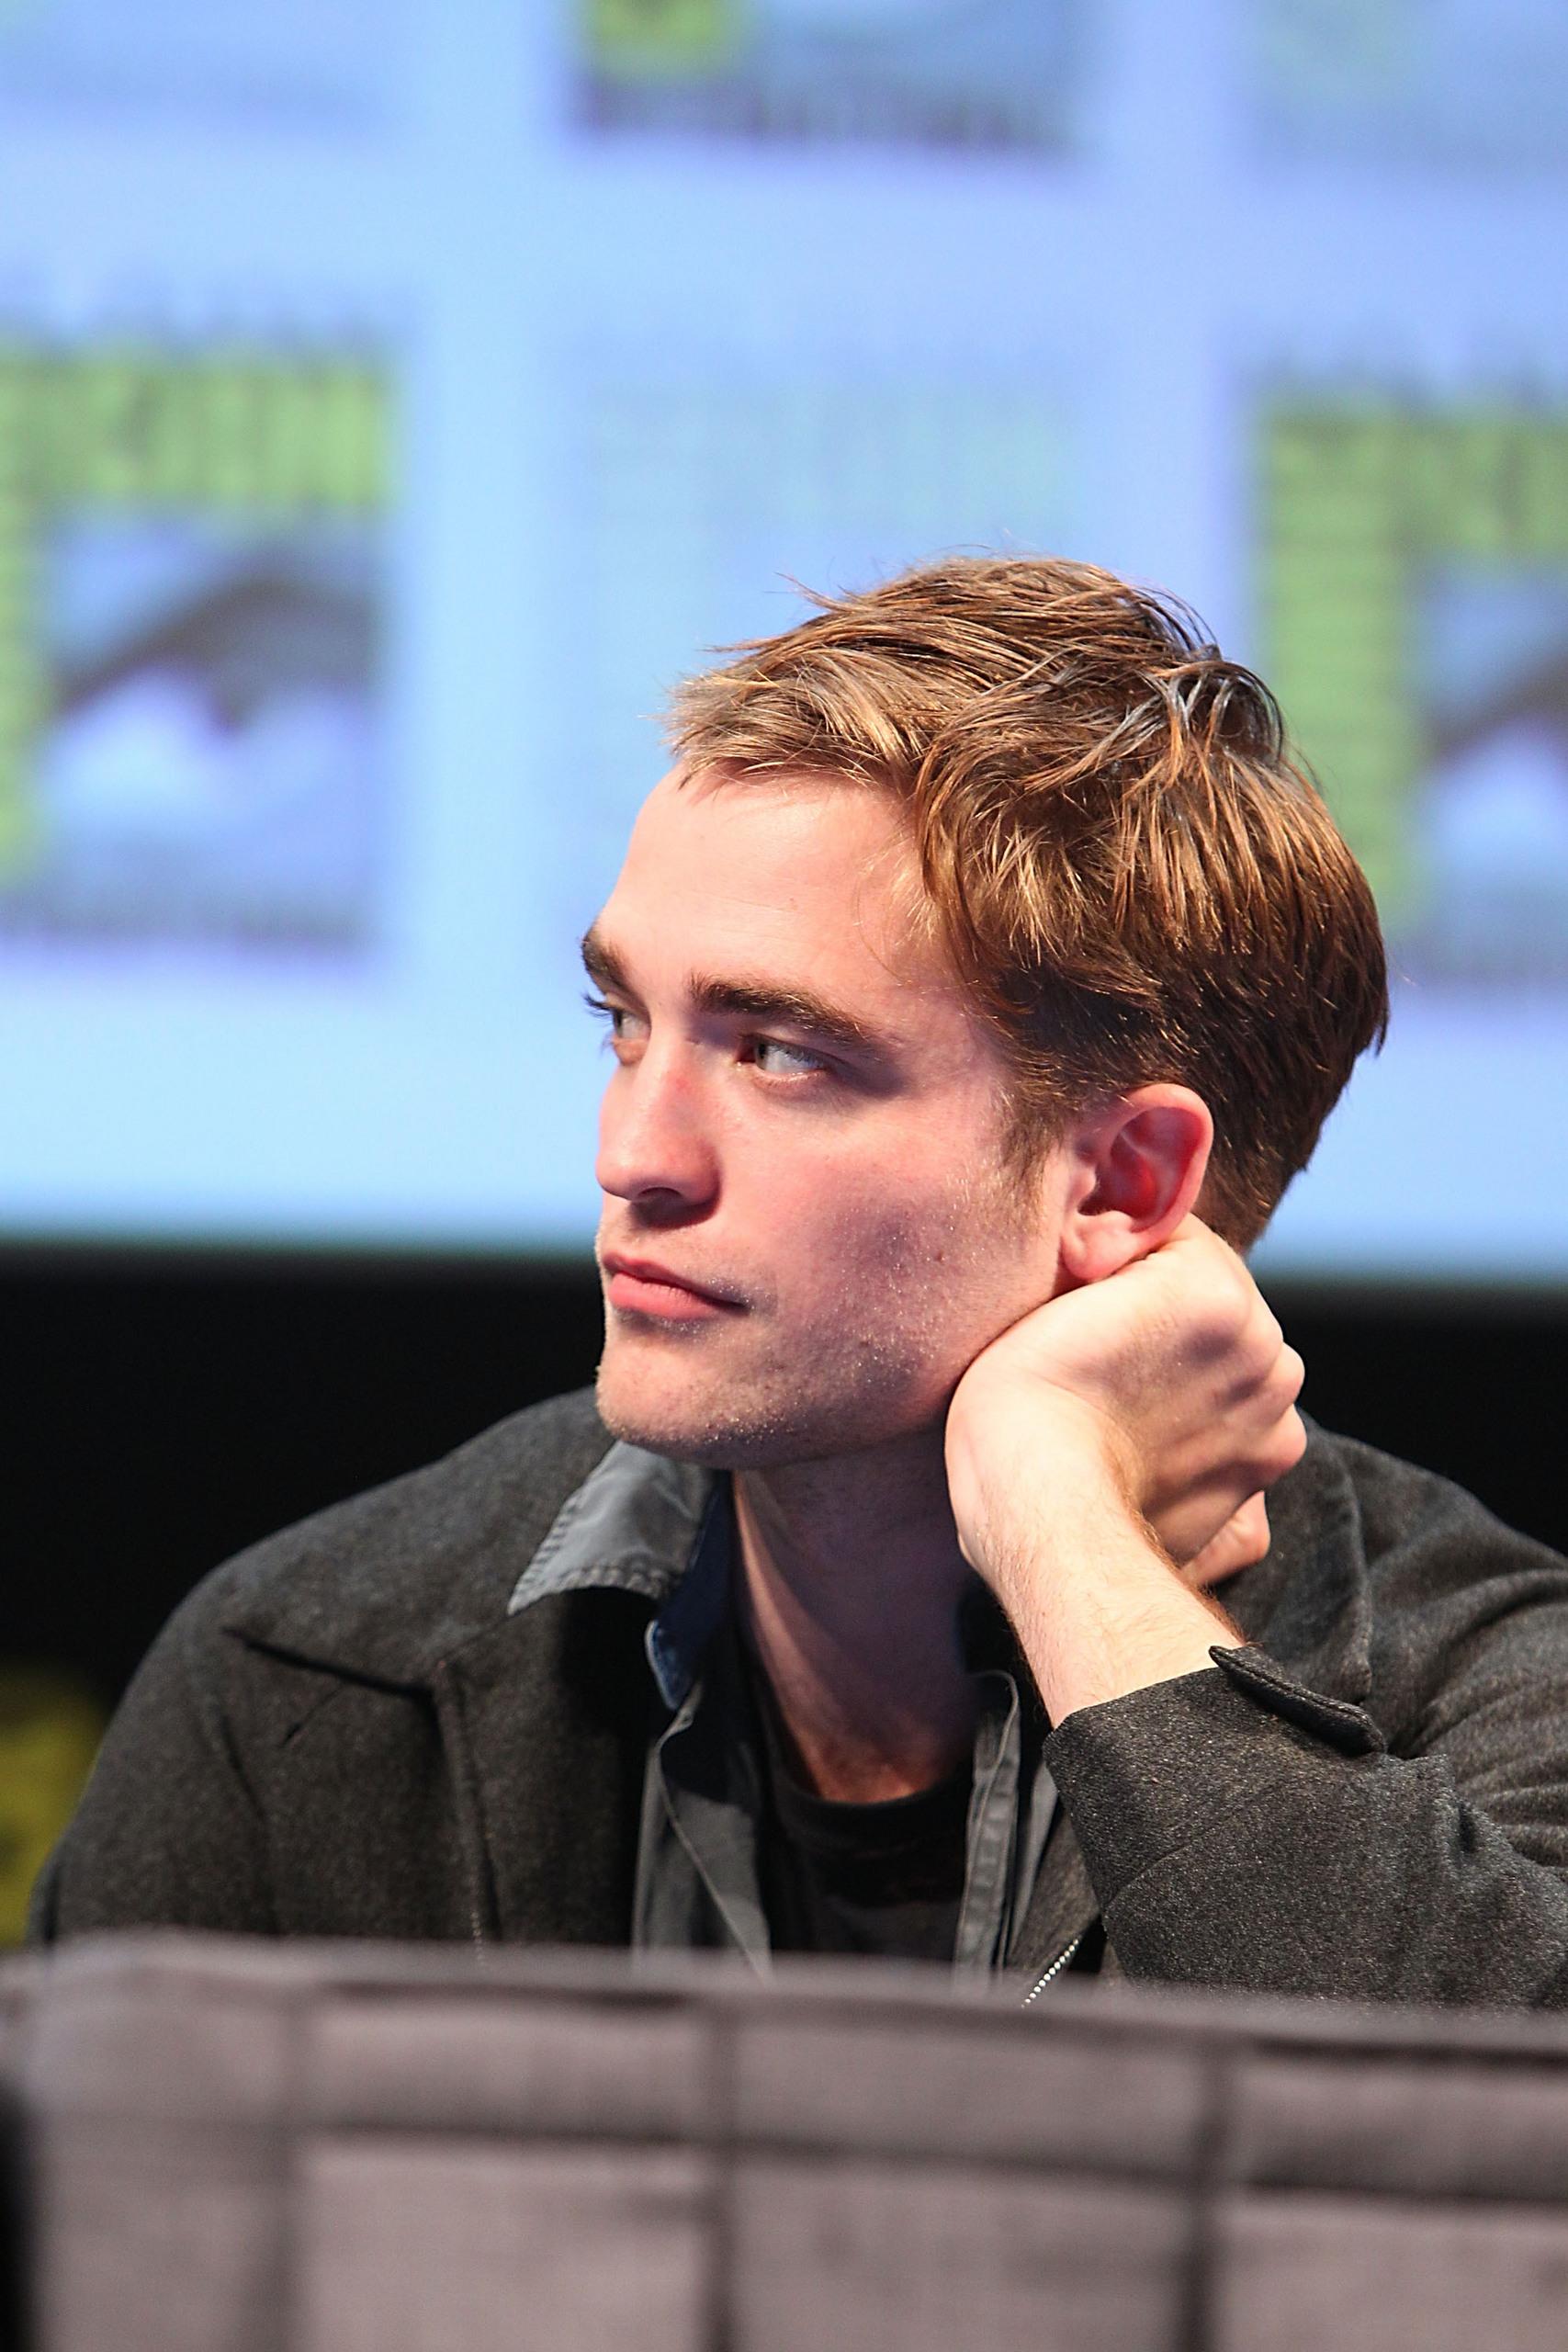 HQ pictures of Robert Pattinson with Kristen Stewart, Taylor Lautner